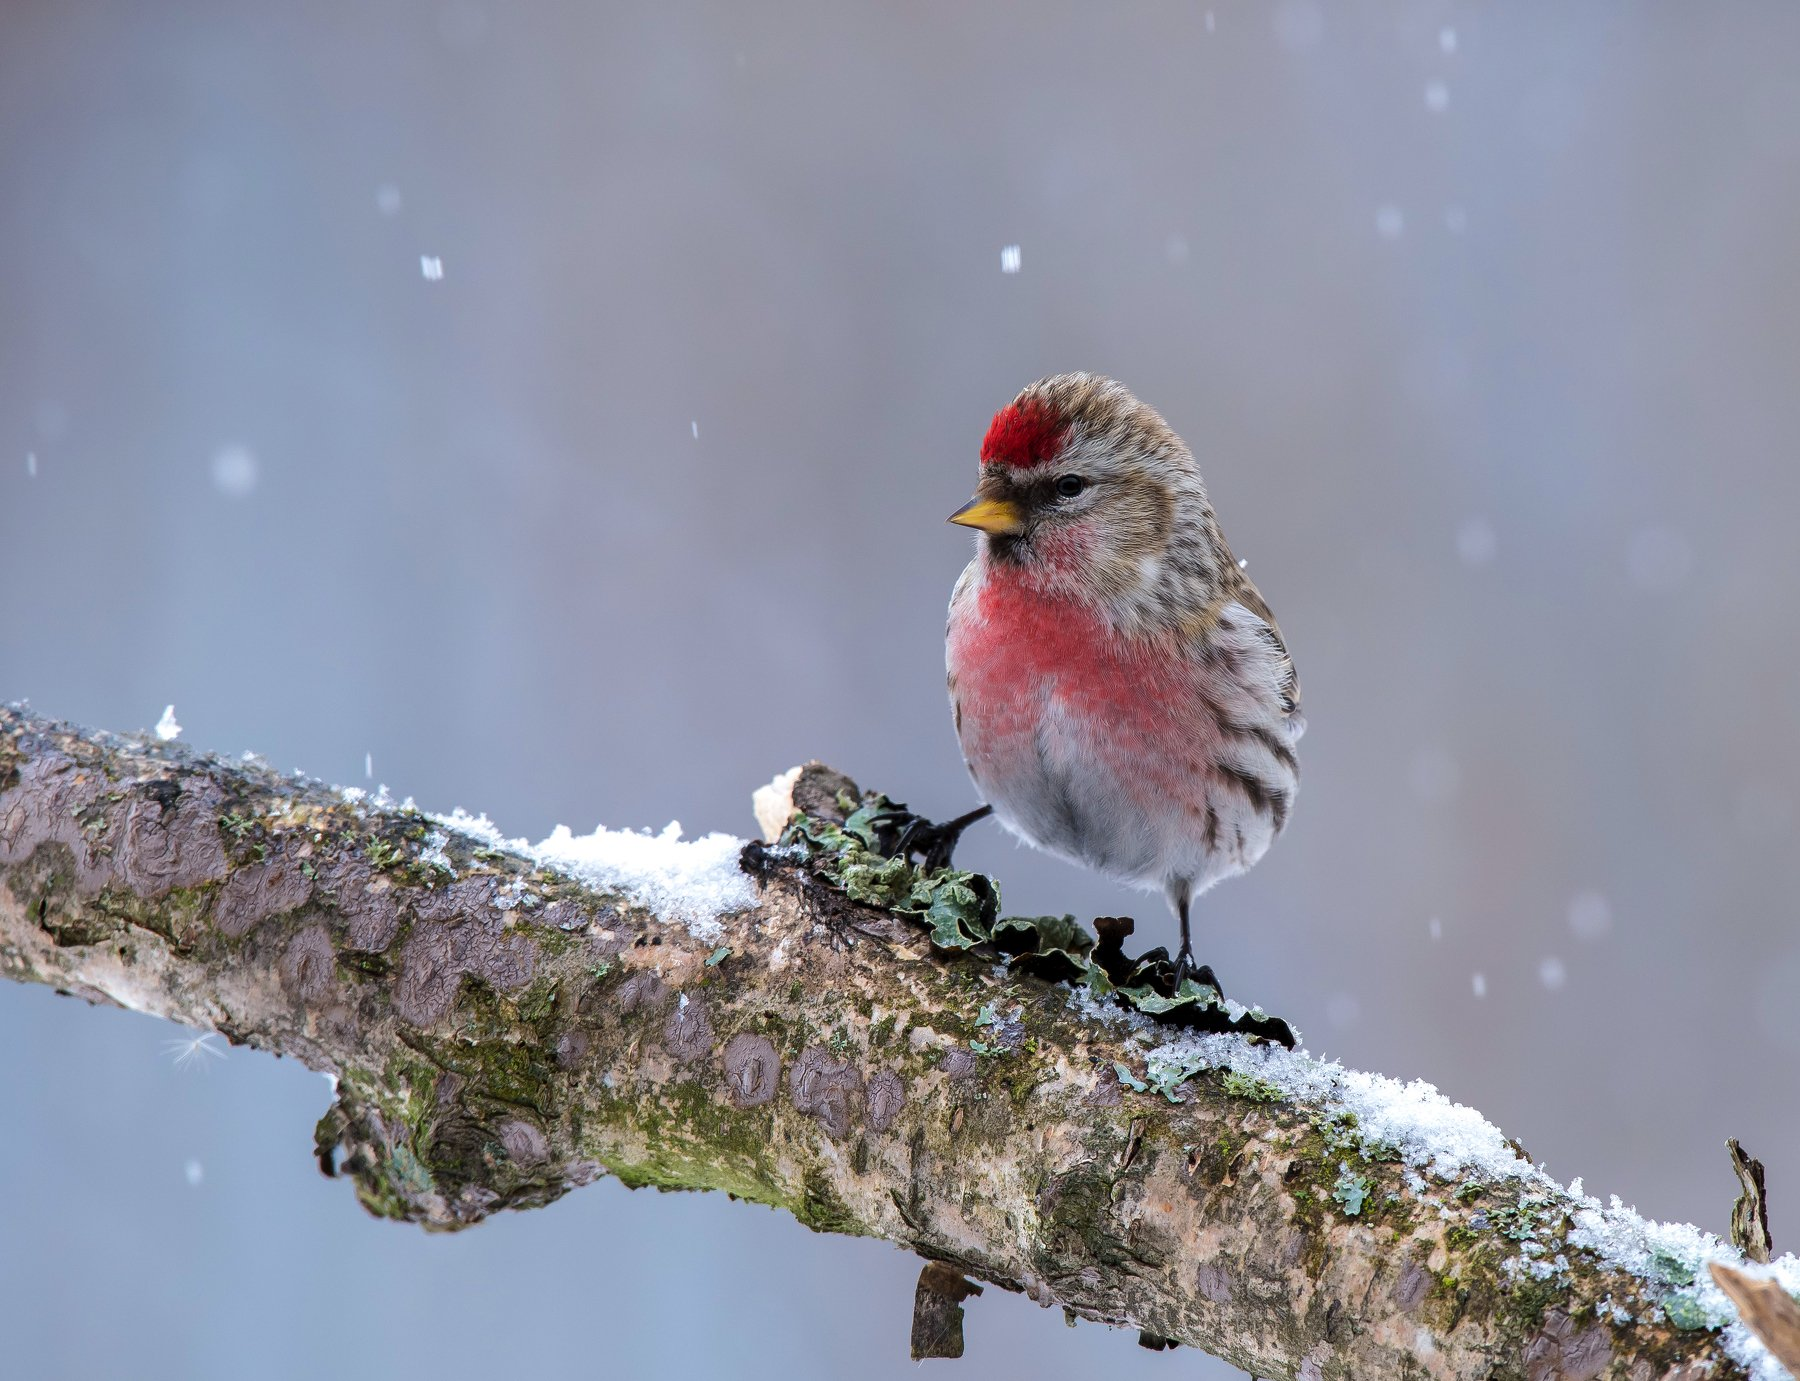 птицы,природа,зима,, Киселёв Андрей